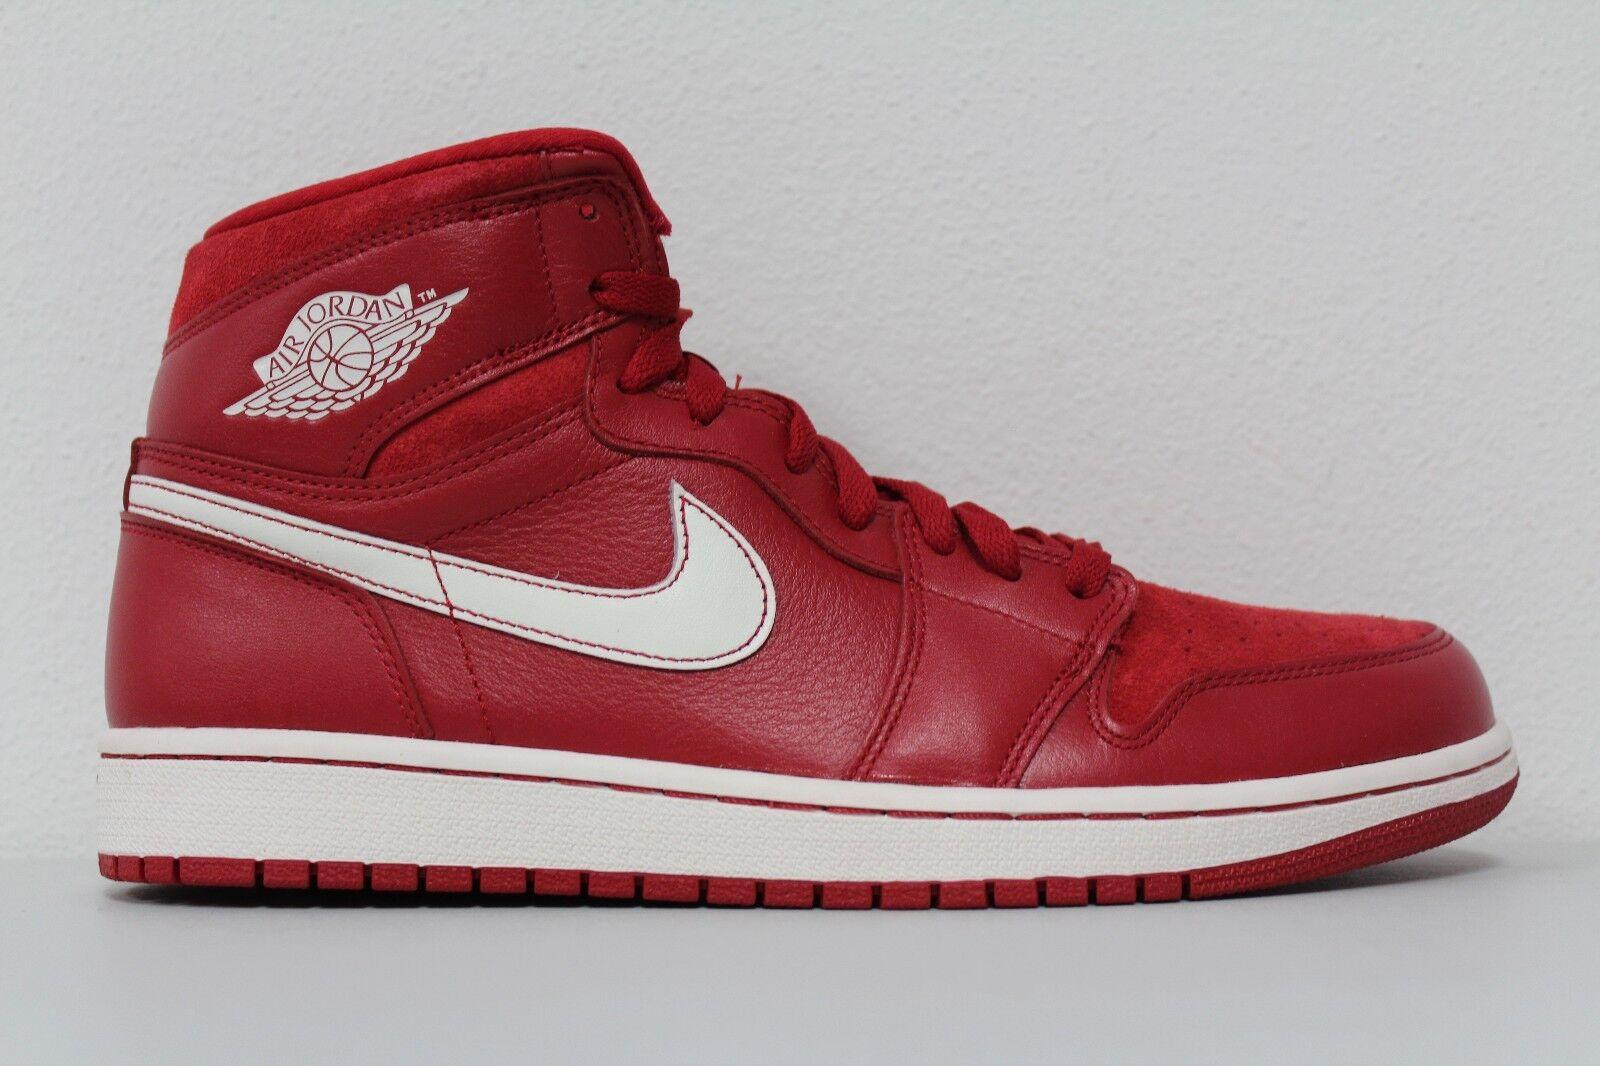 Nike Mens Air Jordan 1 Retro High OG Sz 10 Gym Red Toro Red Sail Wht 555088-601